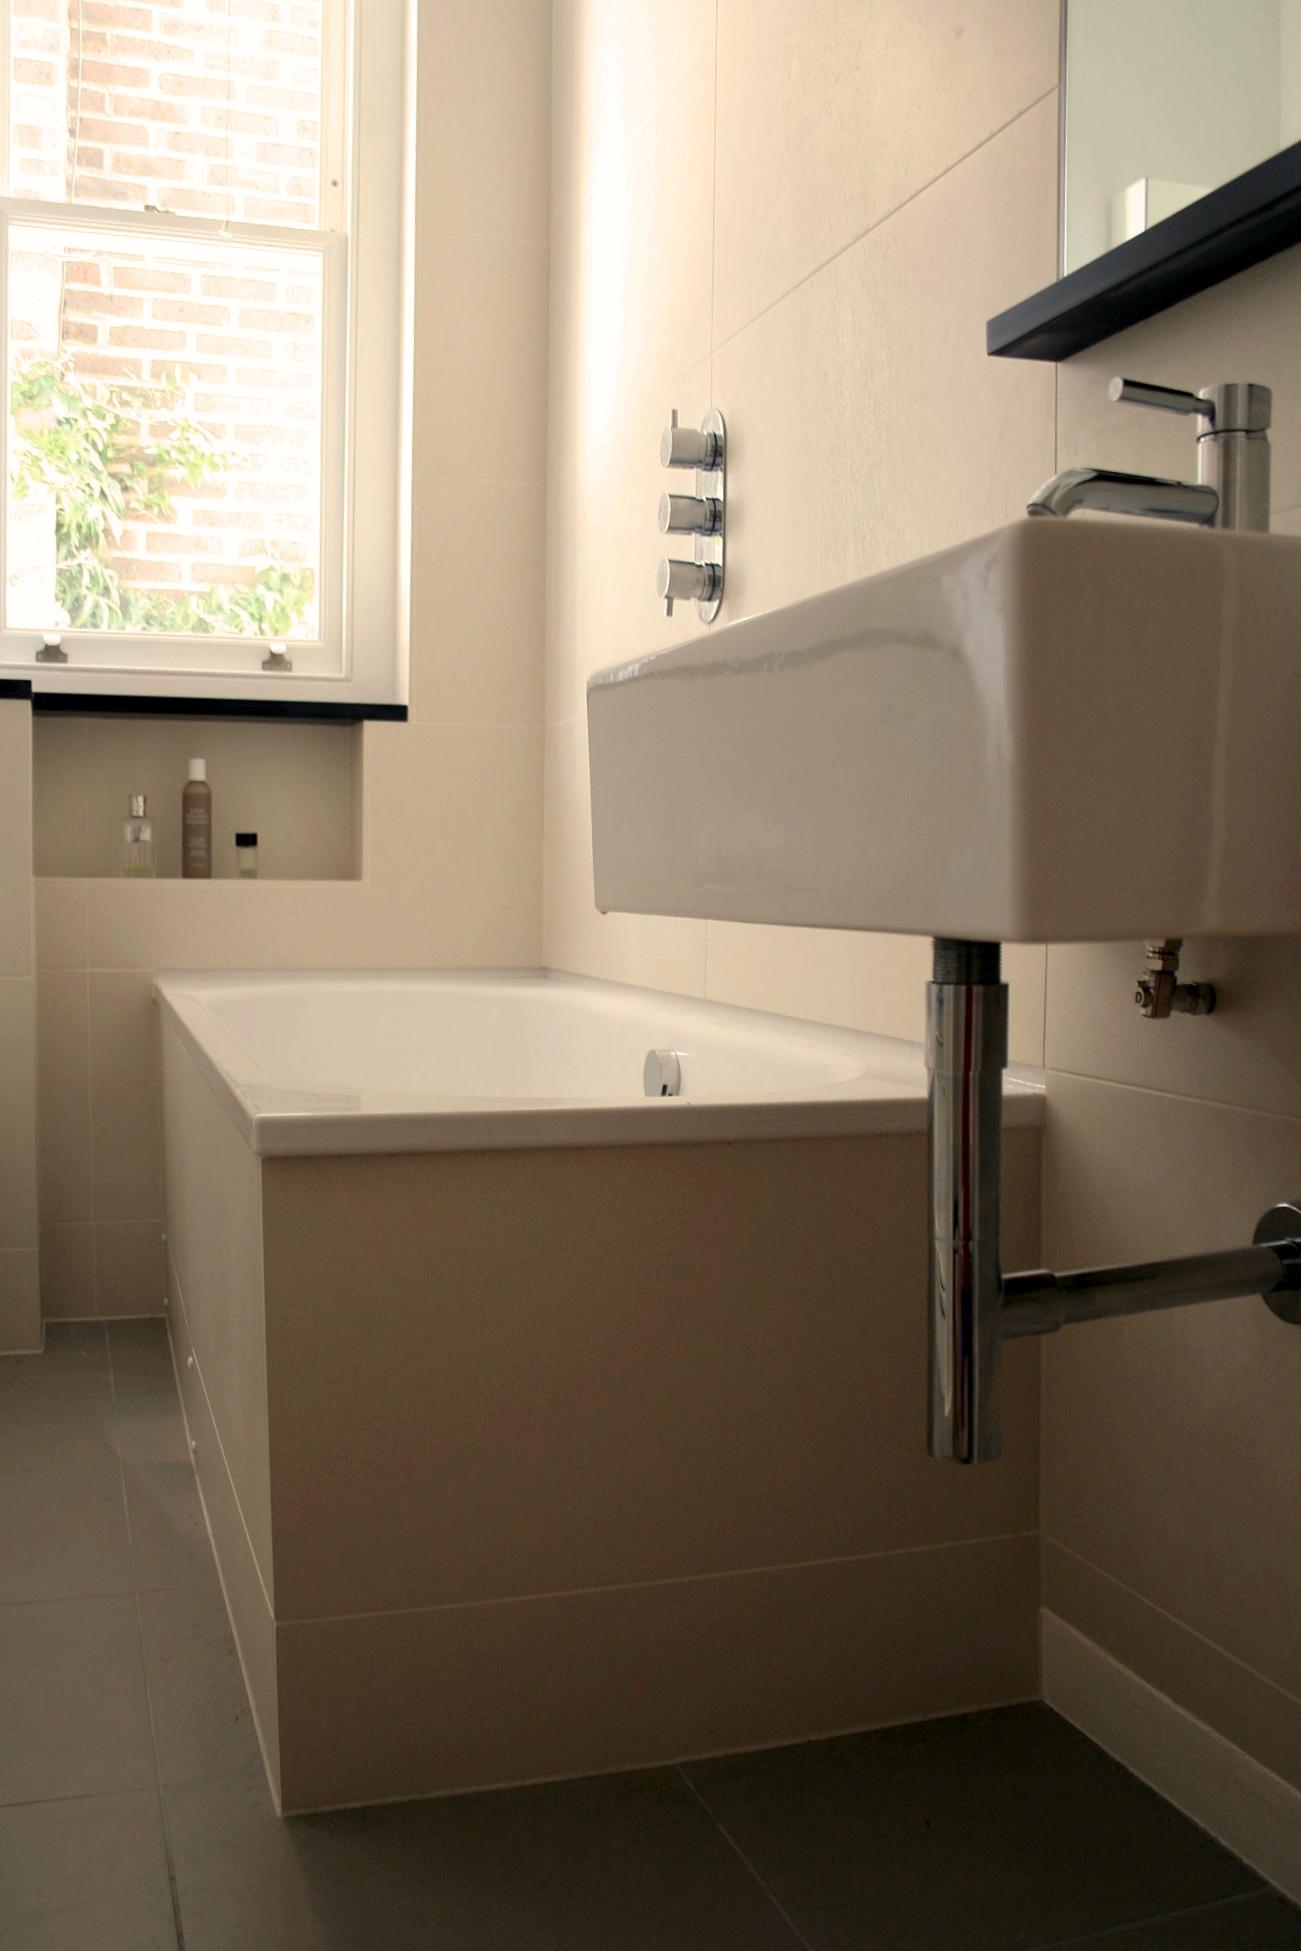 London Bathrooms – London bathrooms